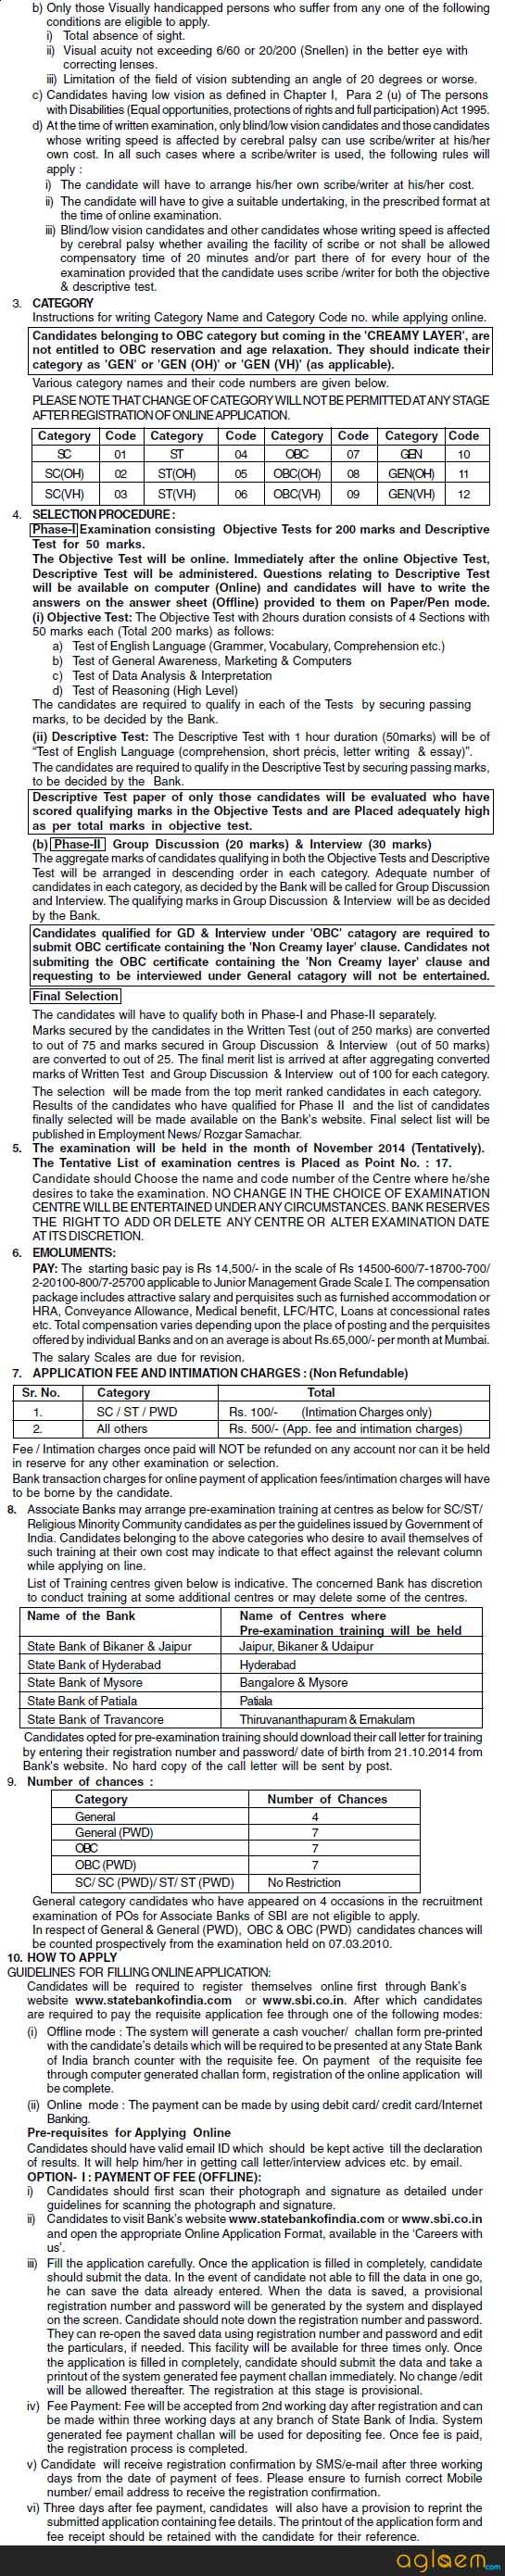 SBI Associate Bank PO Recruitment 2014 Notification Part 2